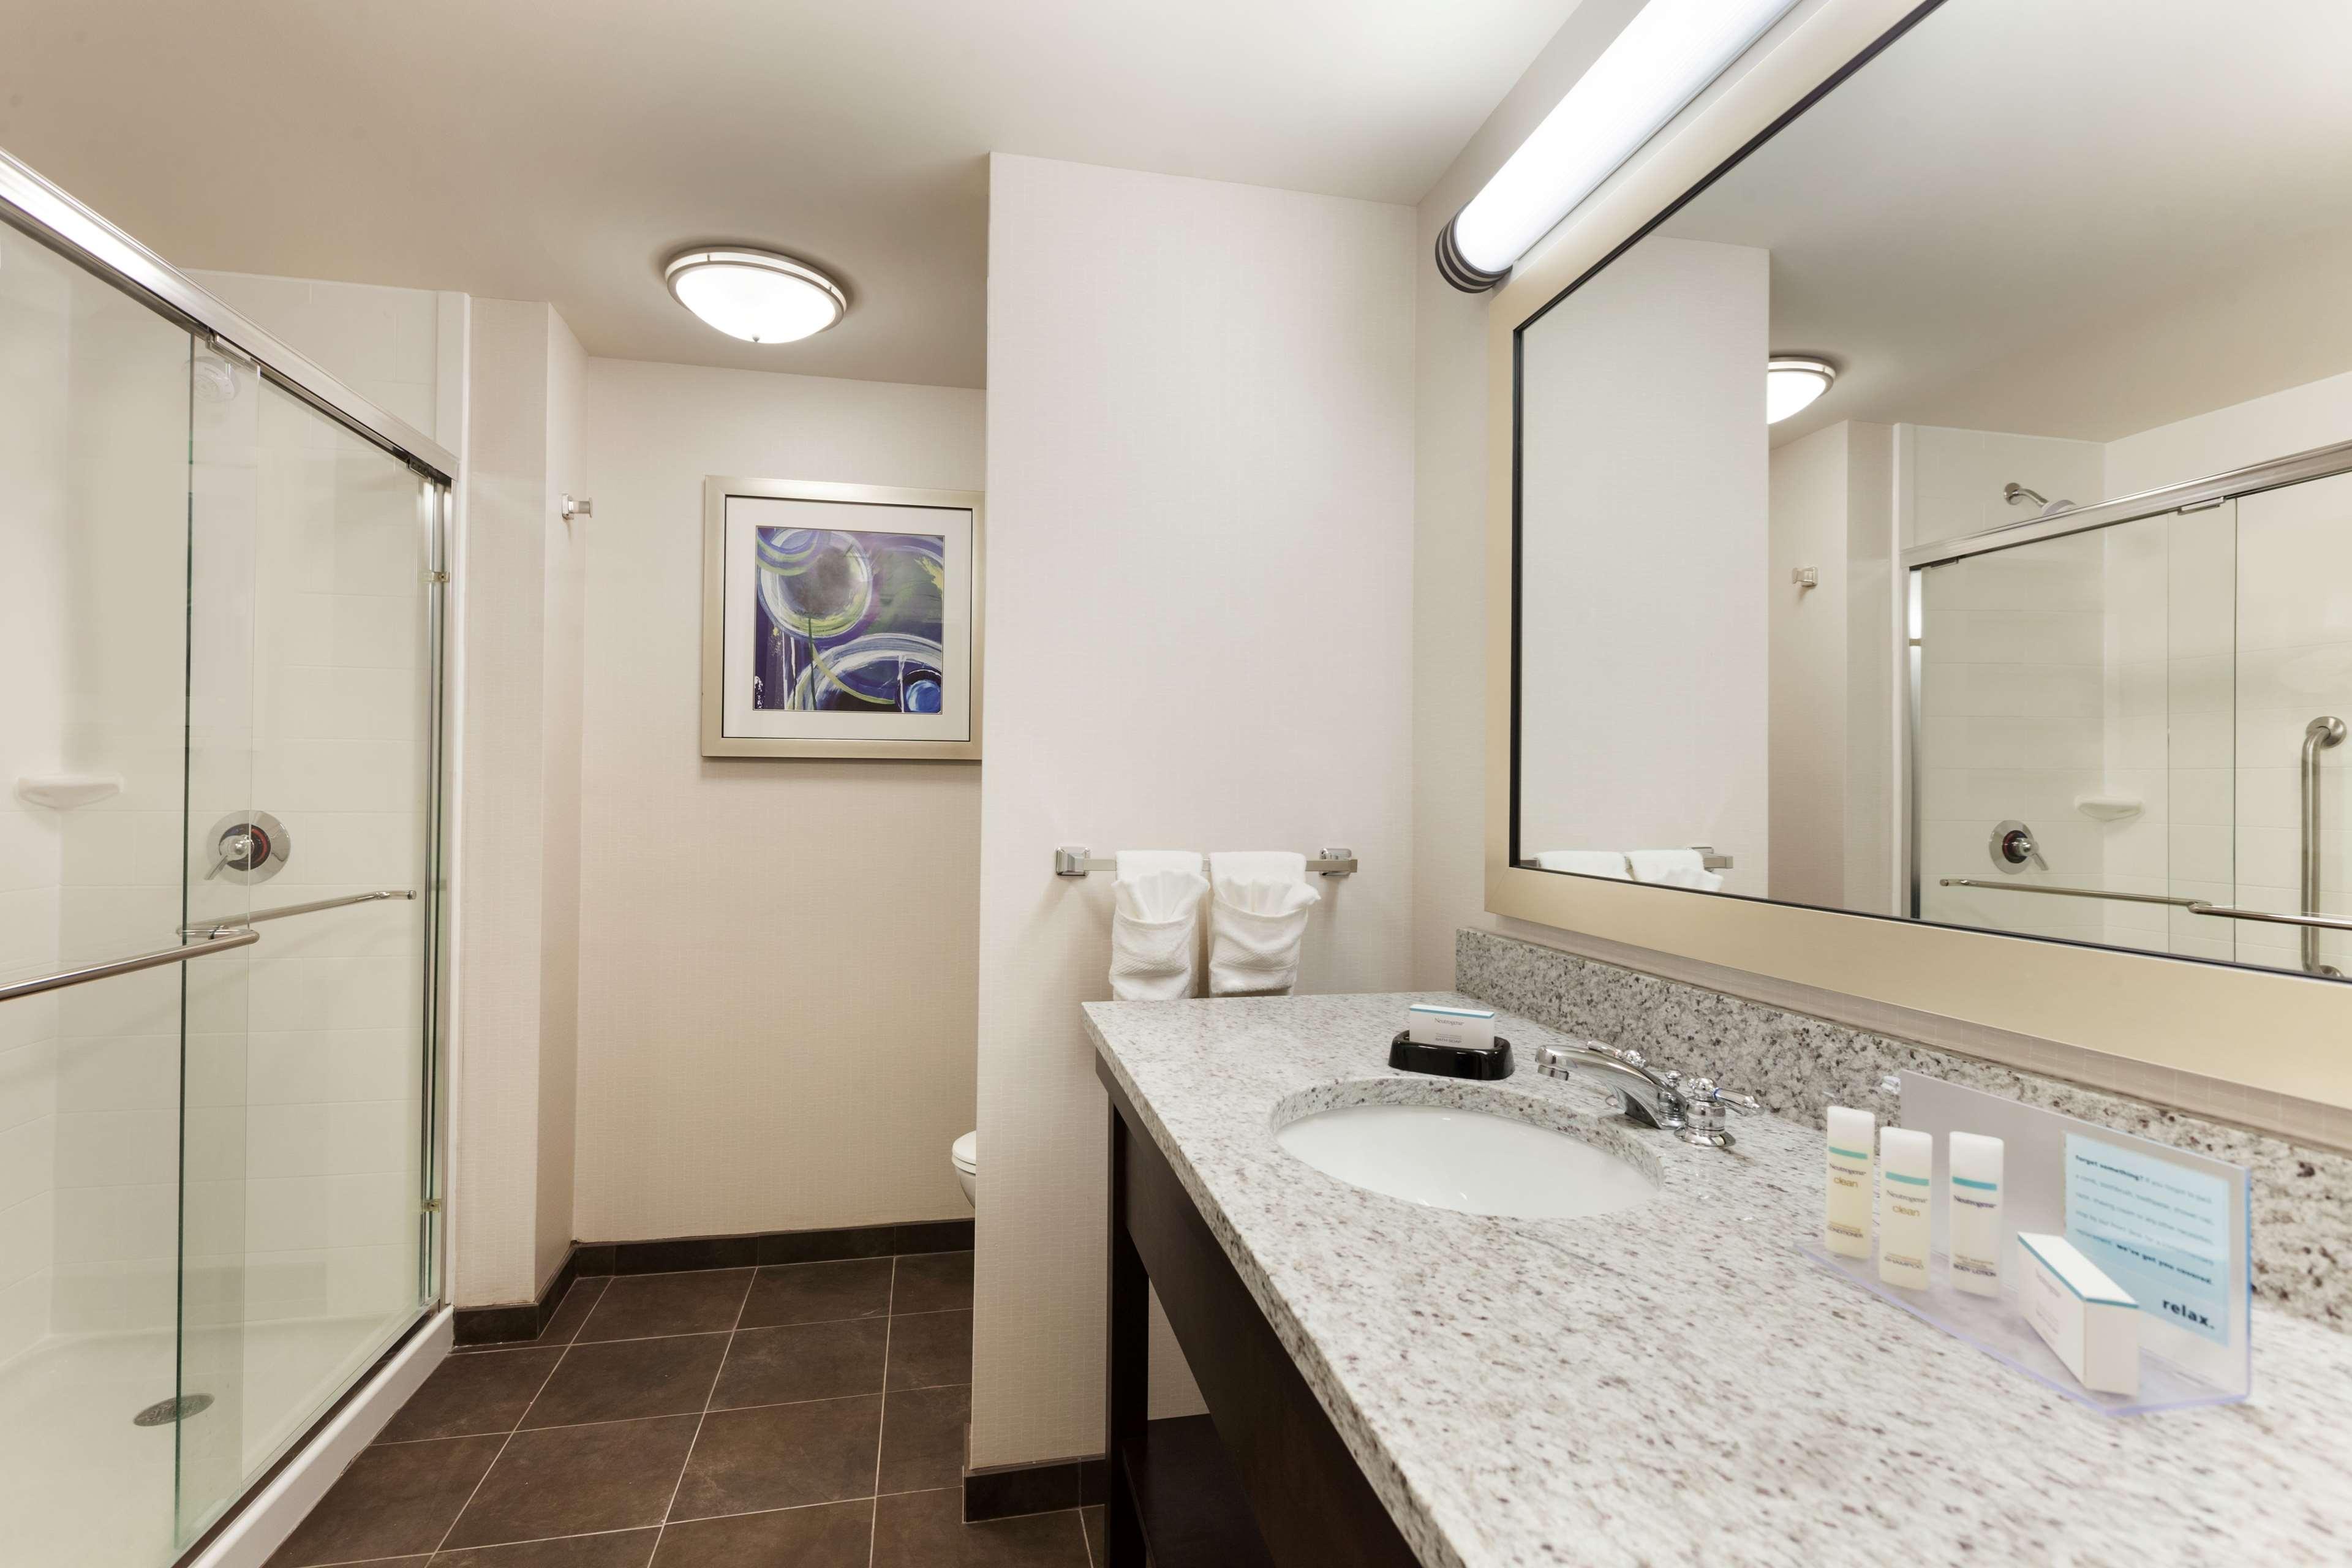 Infiniti Of Suitland >> Hampton Inn & Suites Camp Springs/Andrews AFB, Camp Springs Maryland (MD) - LocalDatabase.com